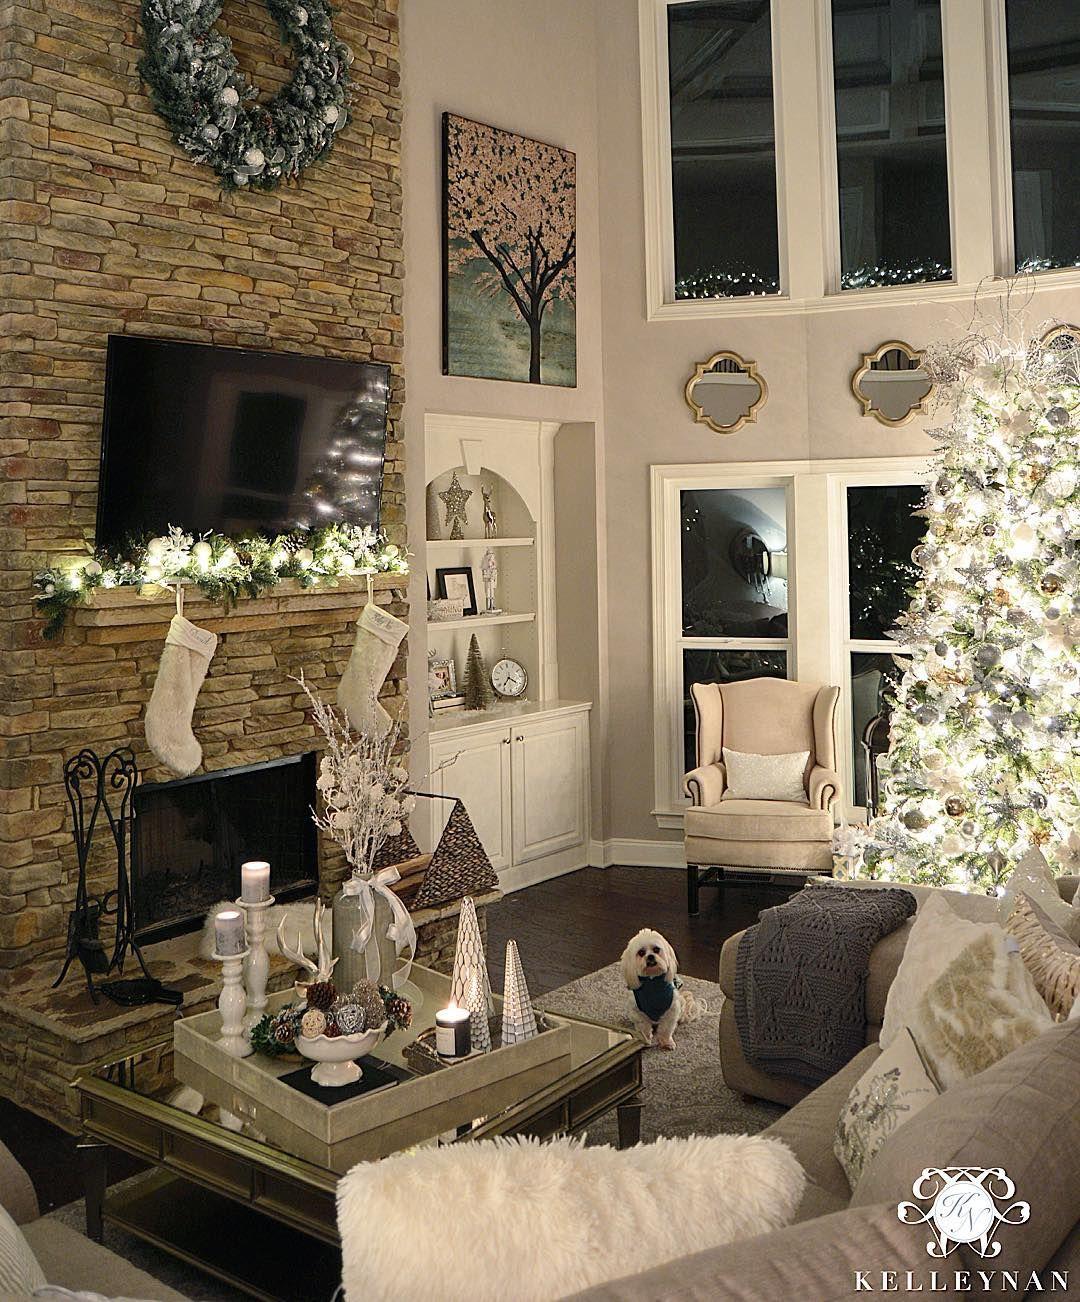 Great Room Decorating Ideas: Kelley Nan (@kelleynan) • Instagram Christmas Tree At